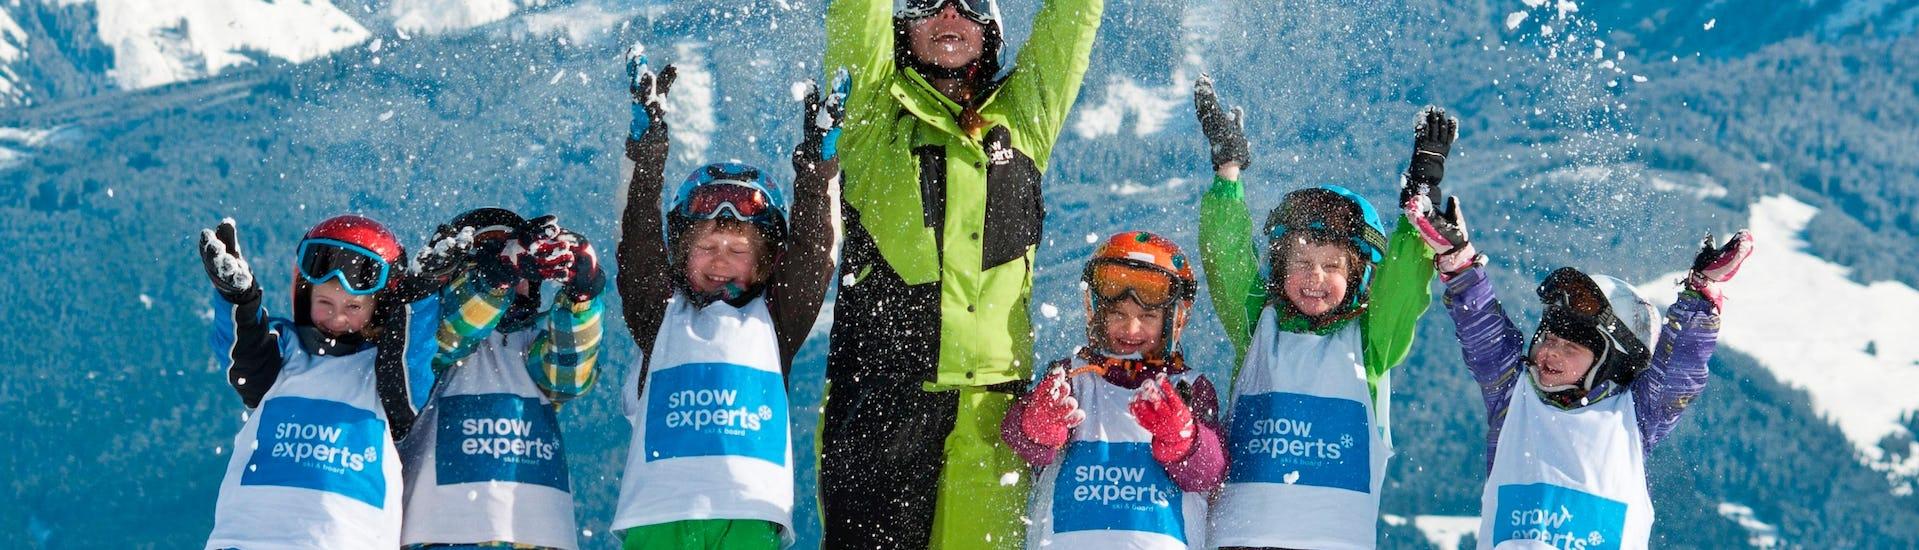 Kids Ski Lessons (5-14 years) - Intermediate